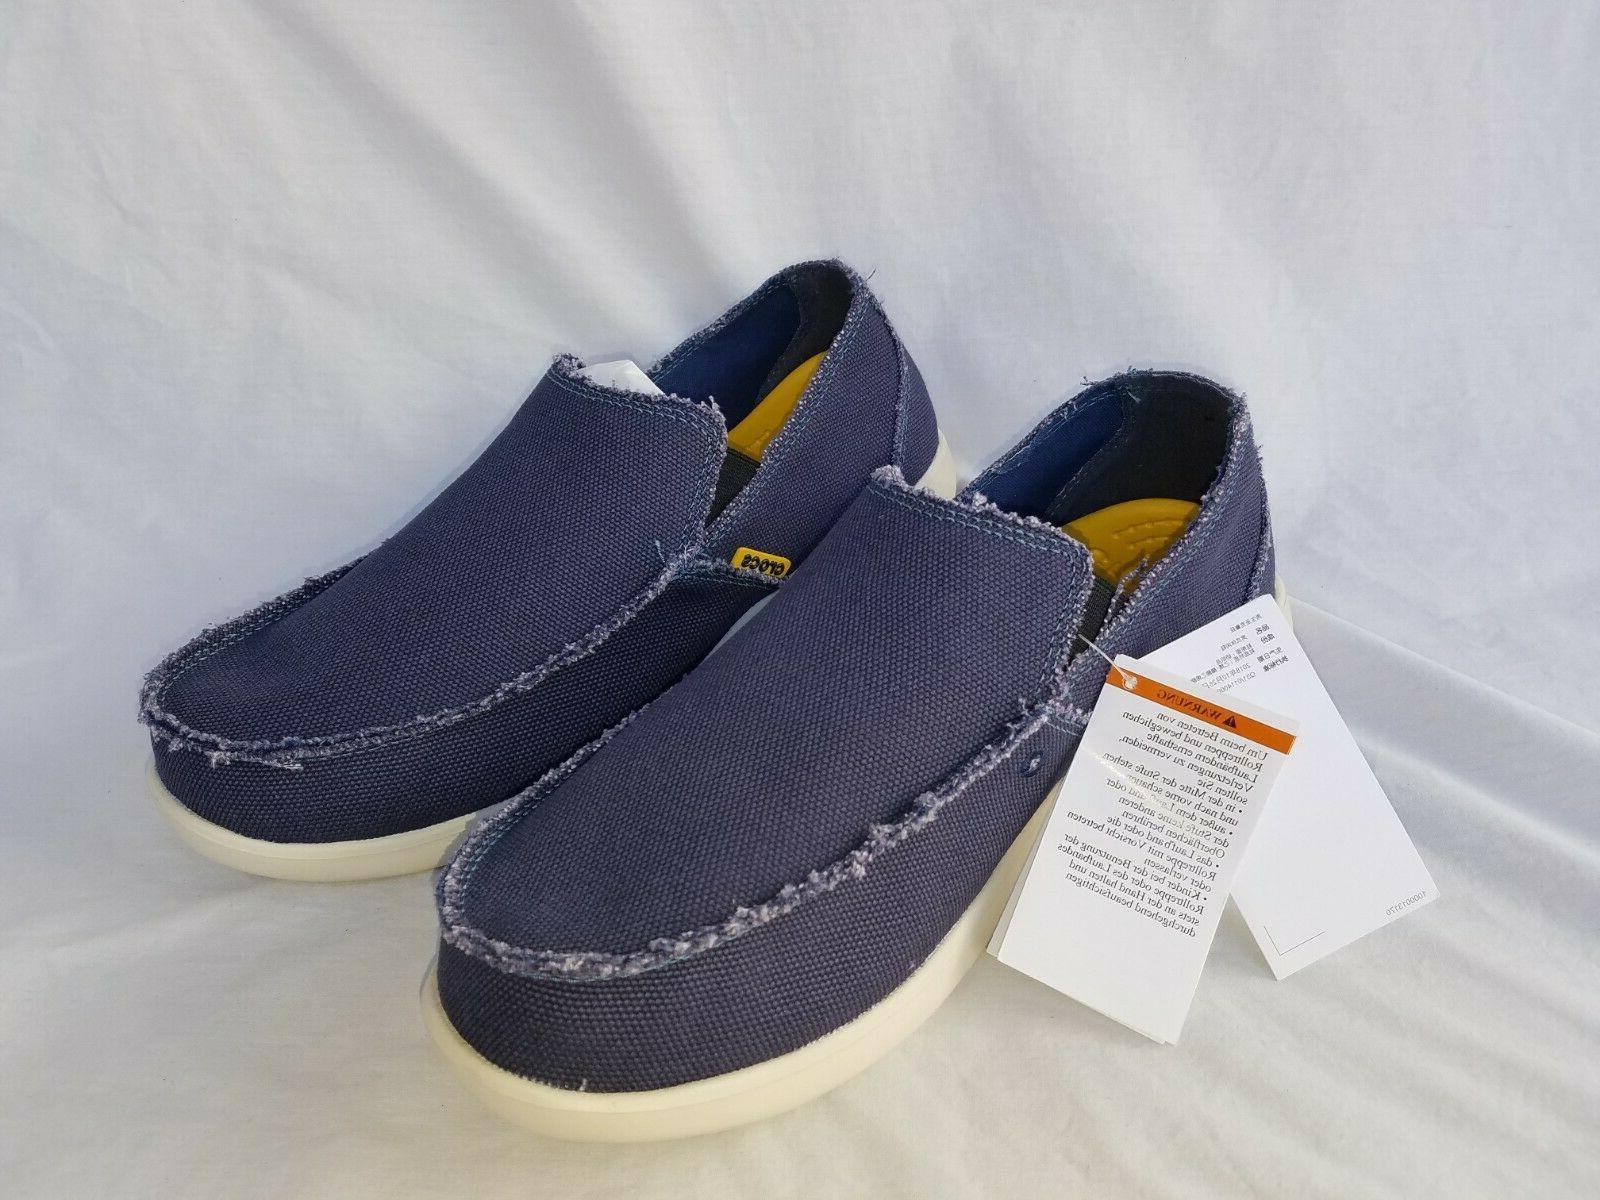 New Santa Cruz Canvas Slip Loafers 10128-46K